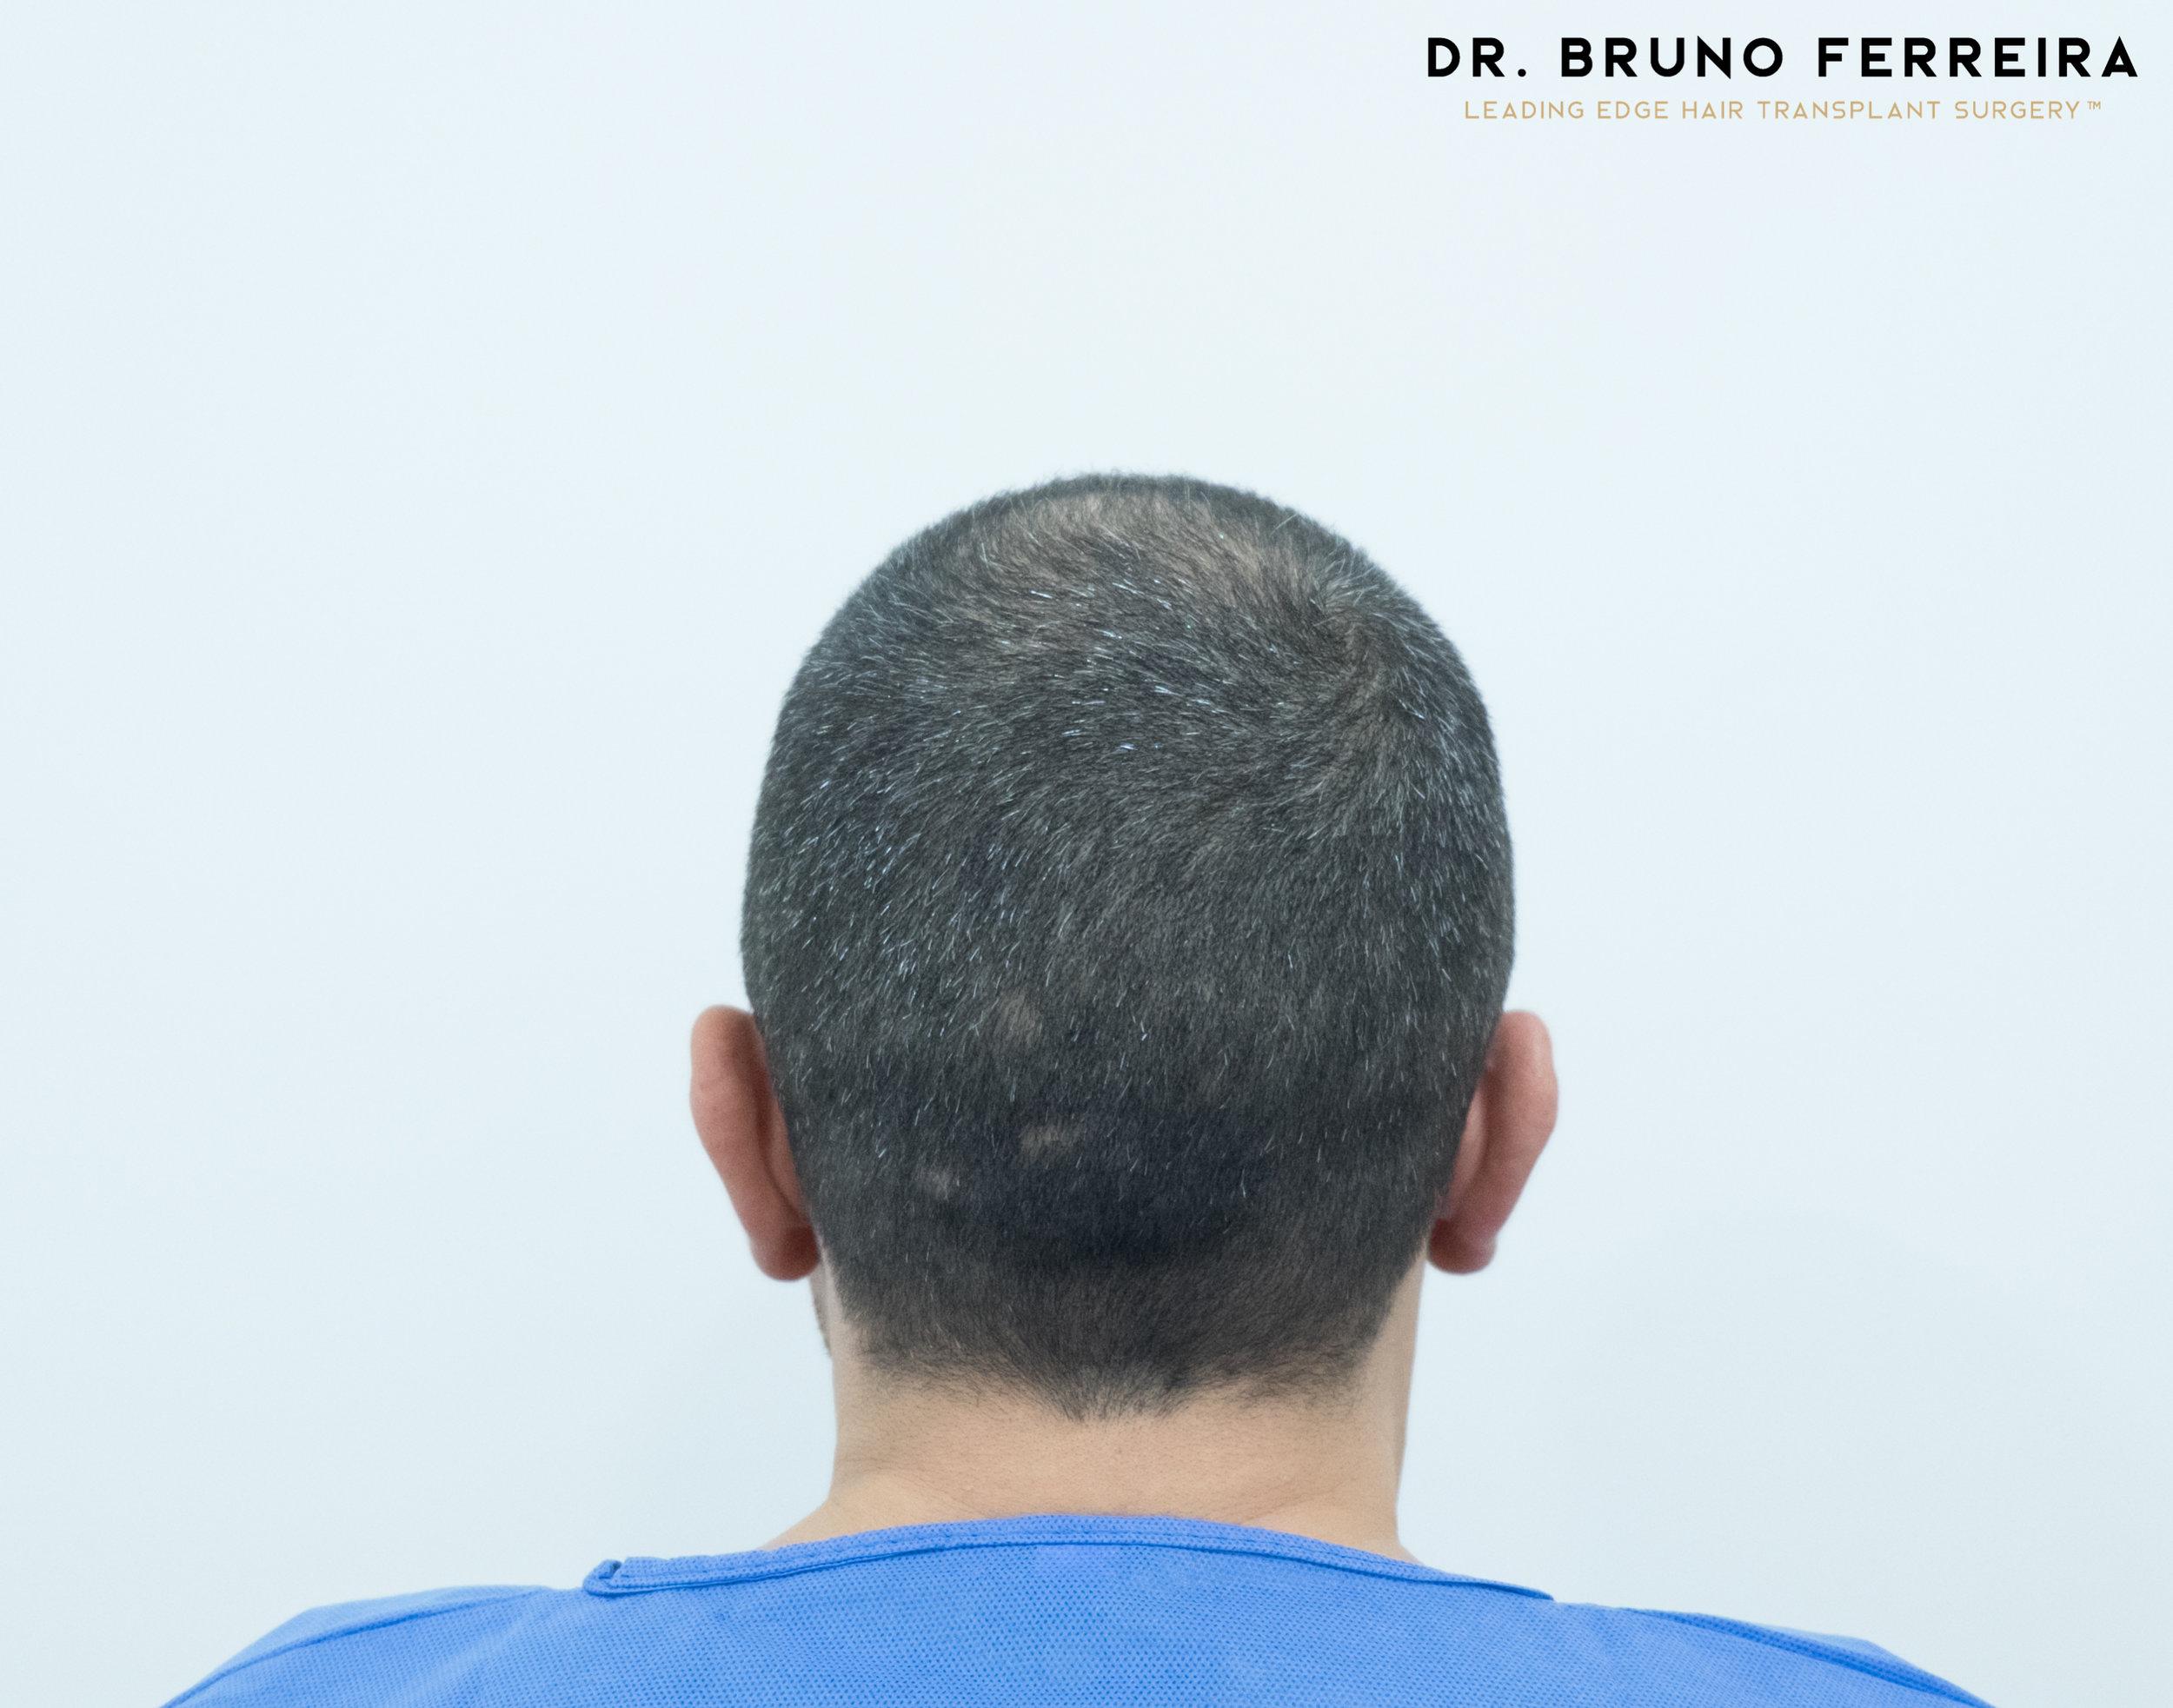 00005 DR. BRUNO FERREIRA (Case 1) - Before - 6.jpg